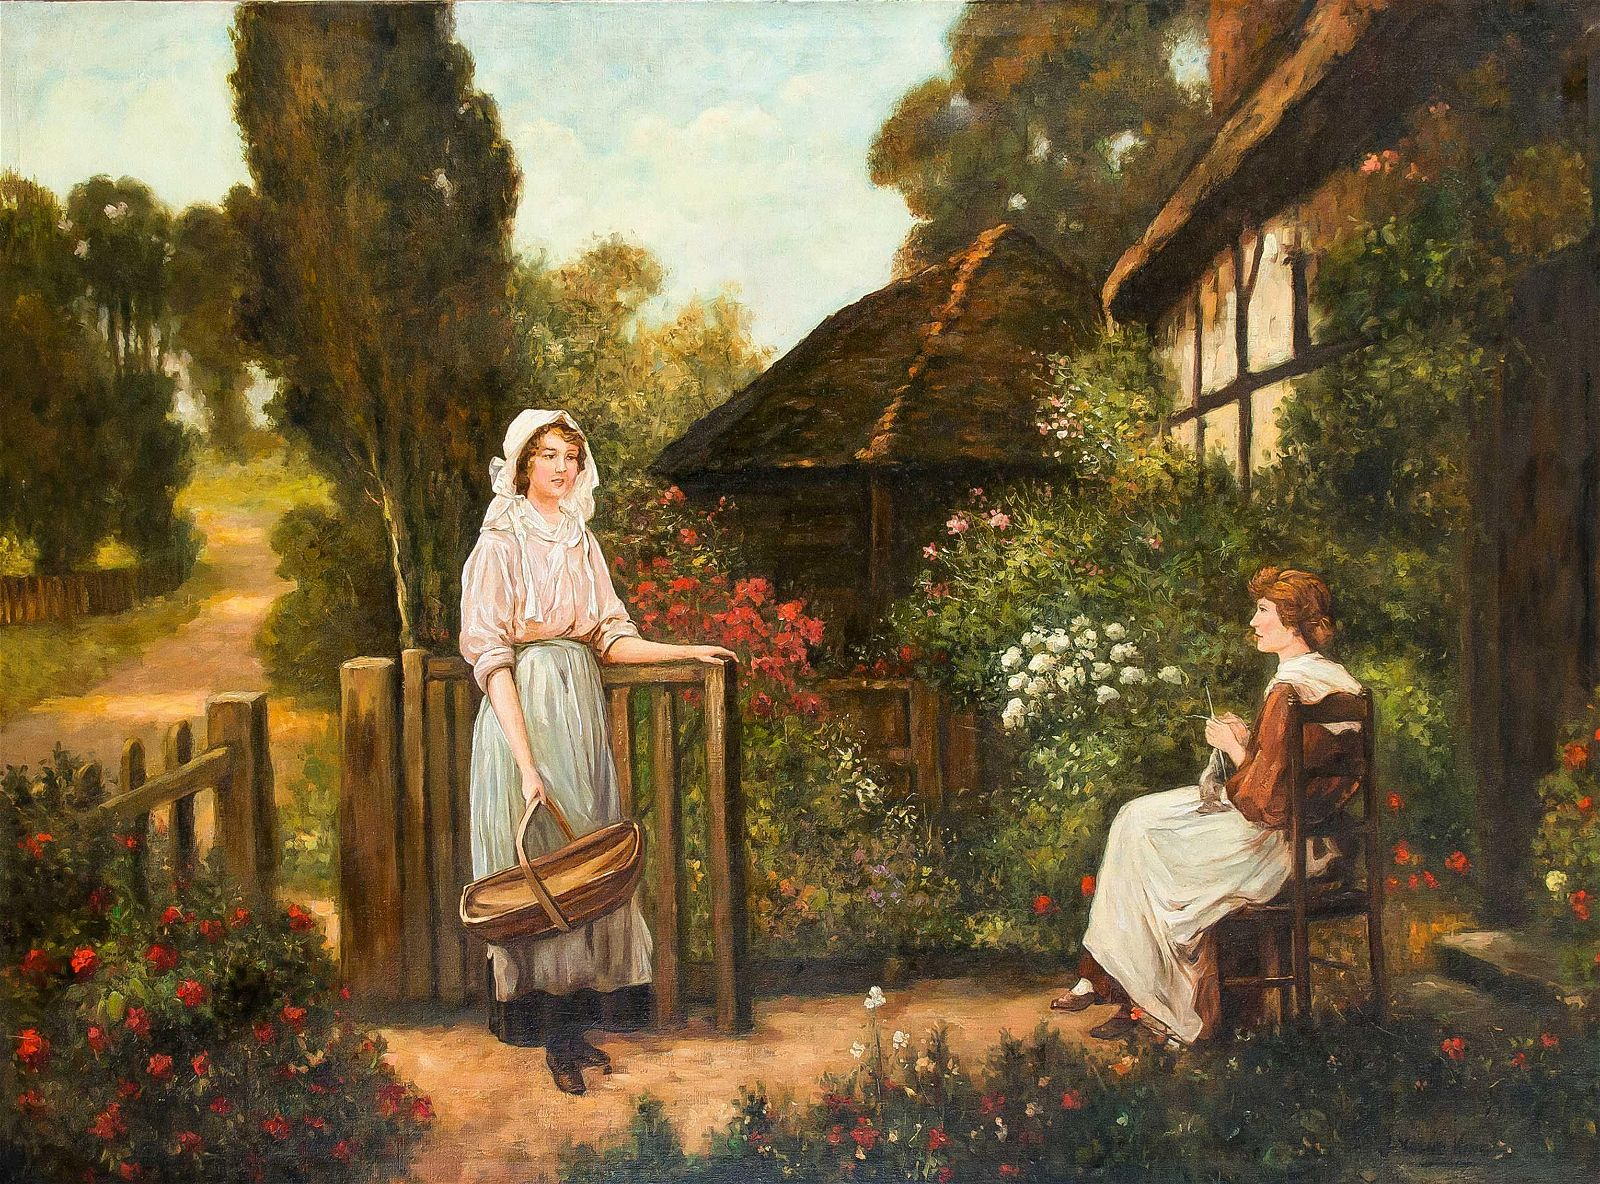 Henry John Yeend King (1855-1924),